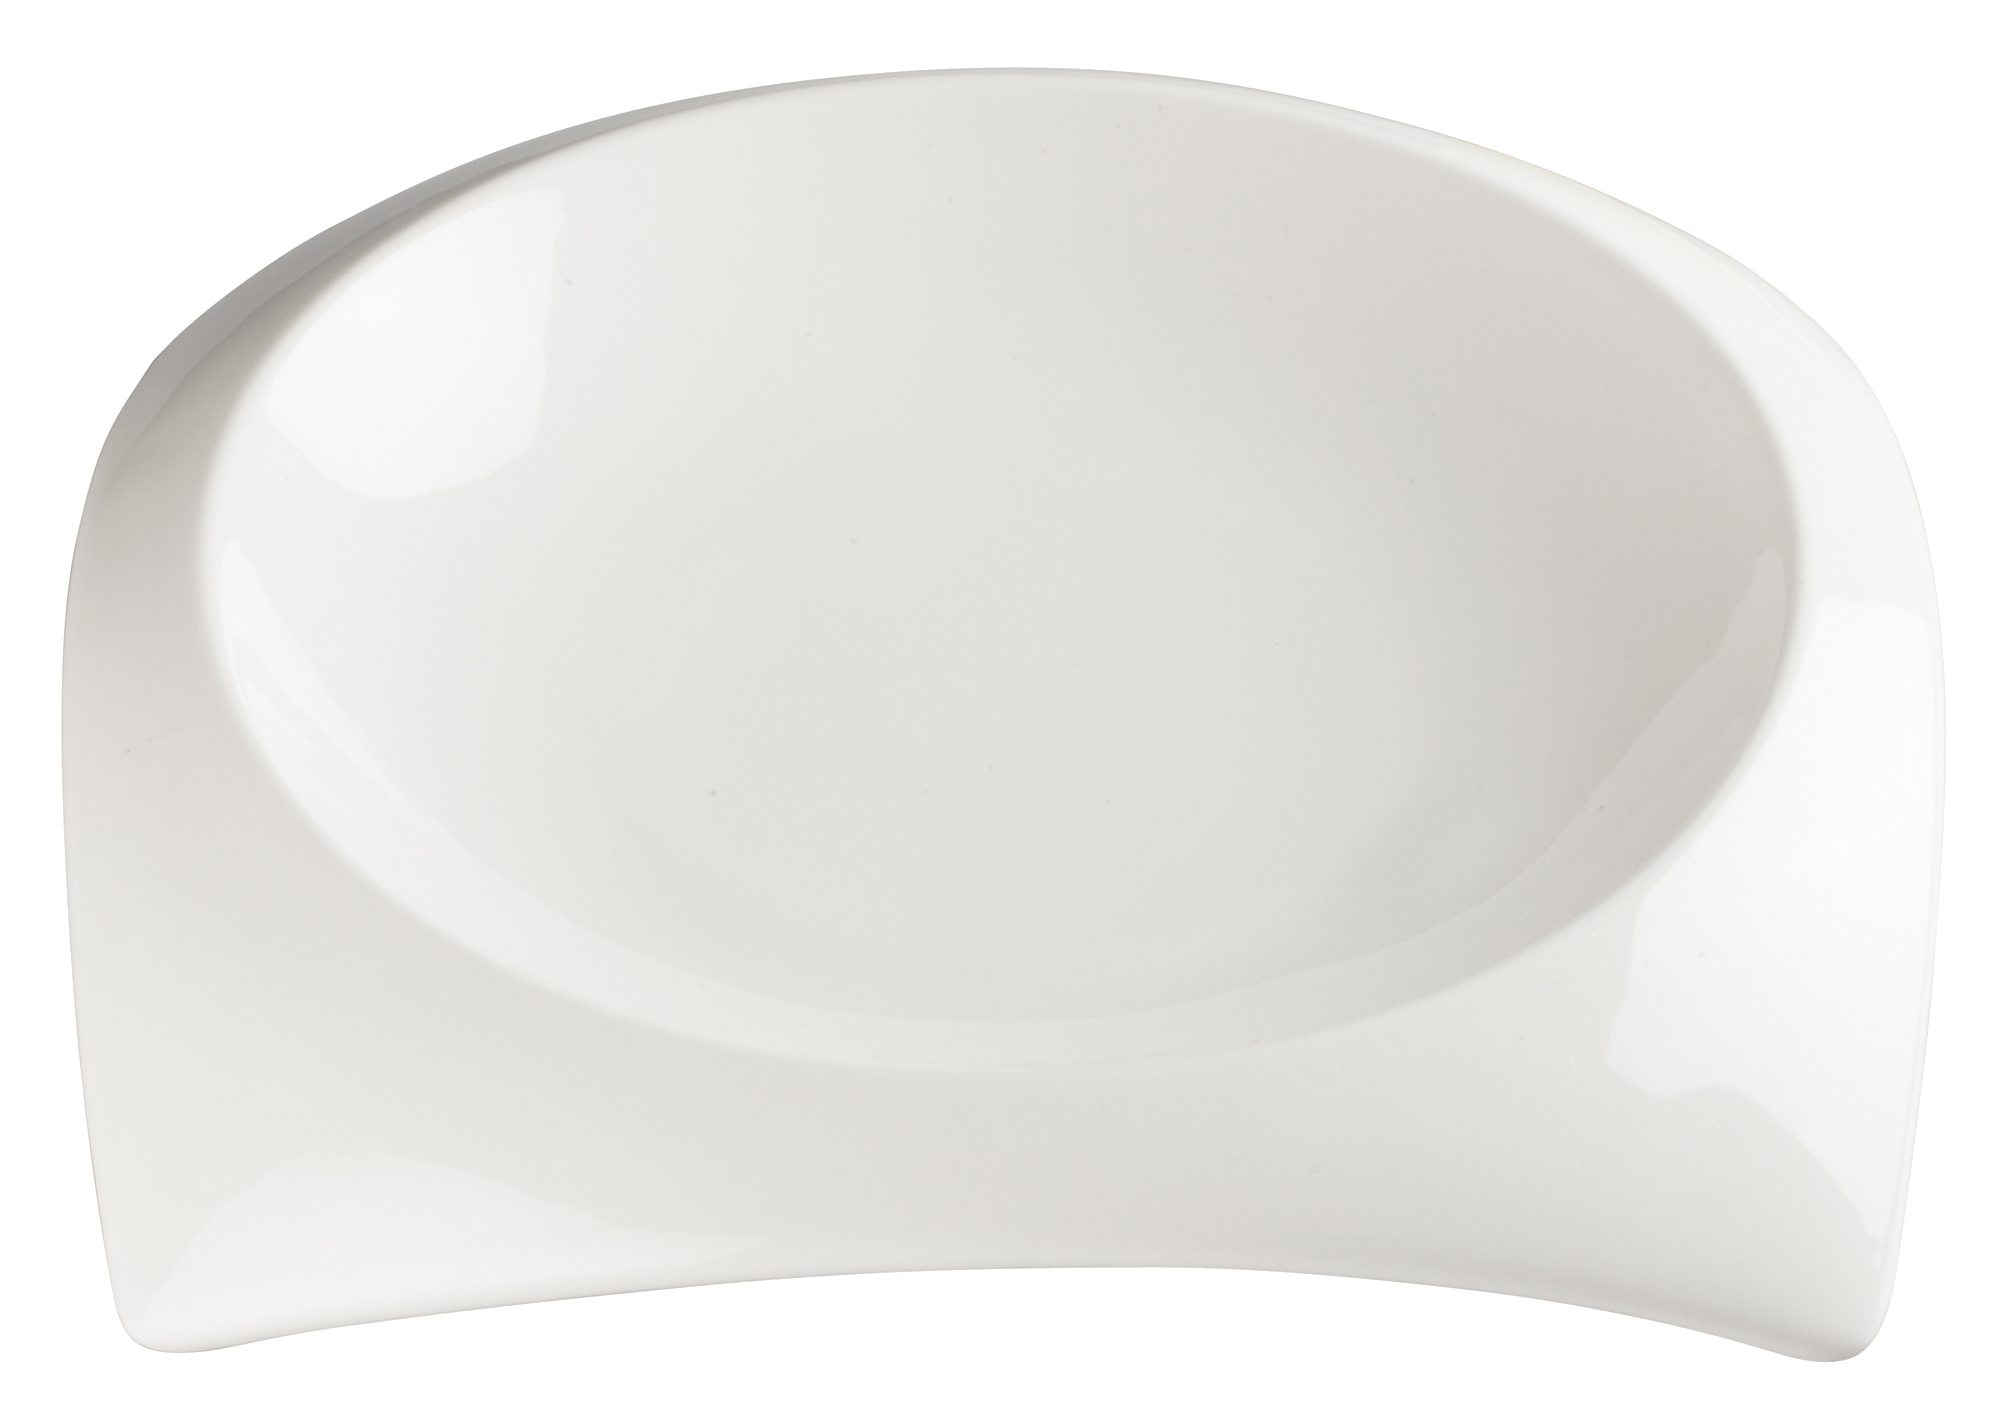 Winco WDP005-103 china, bowl, 17 - 32 oz